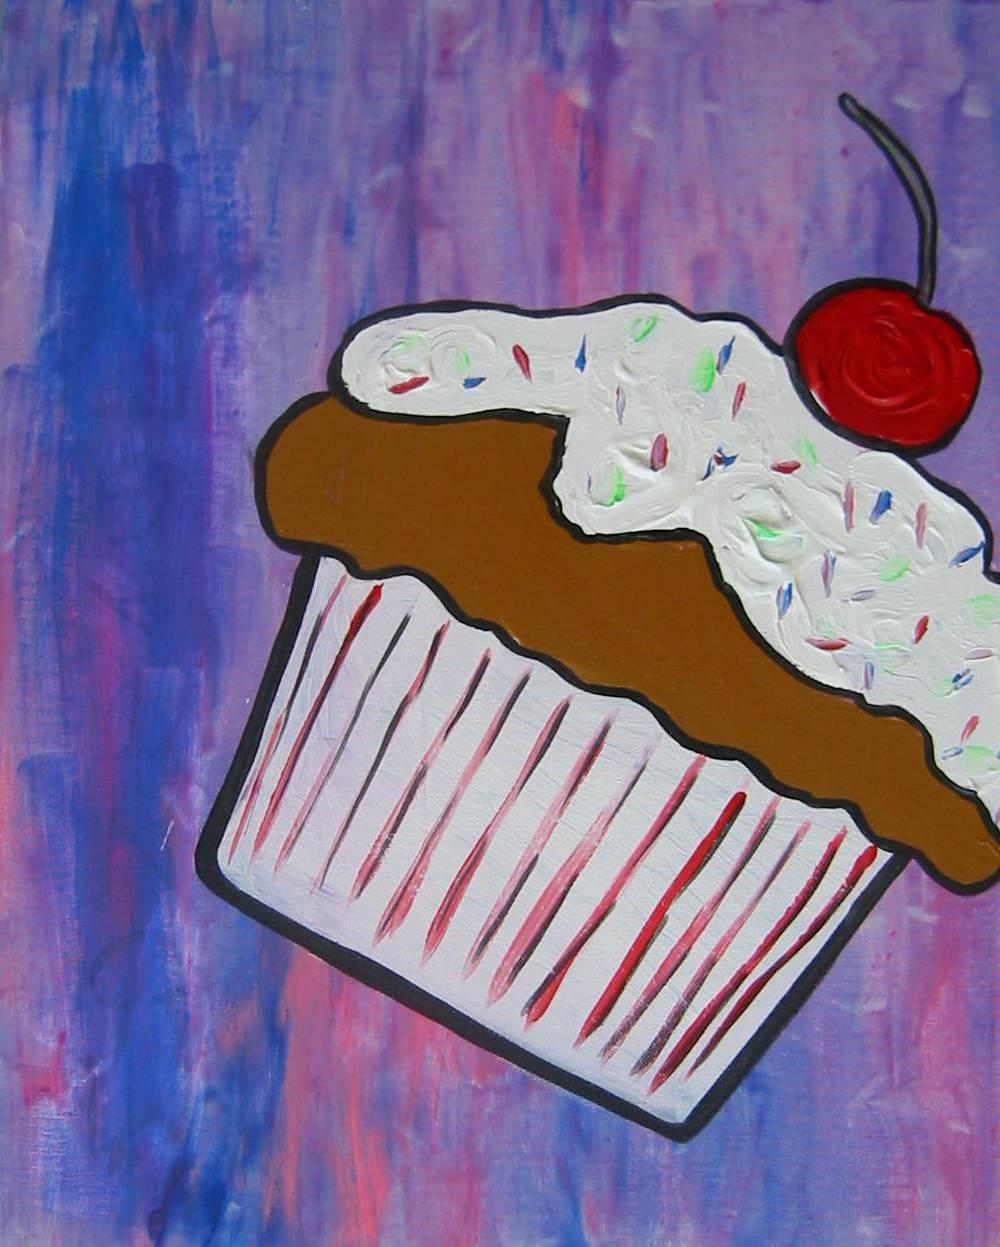 hellokitty cupcake.jpg